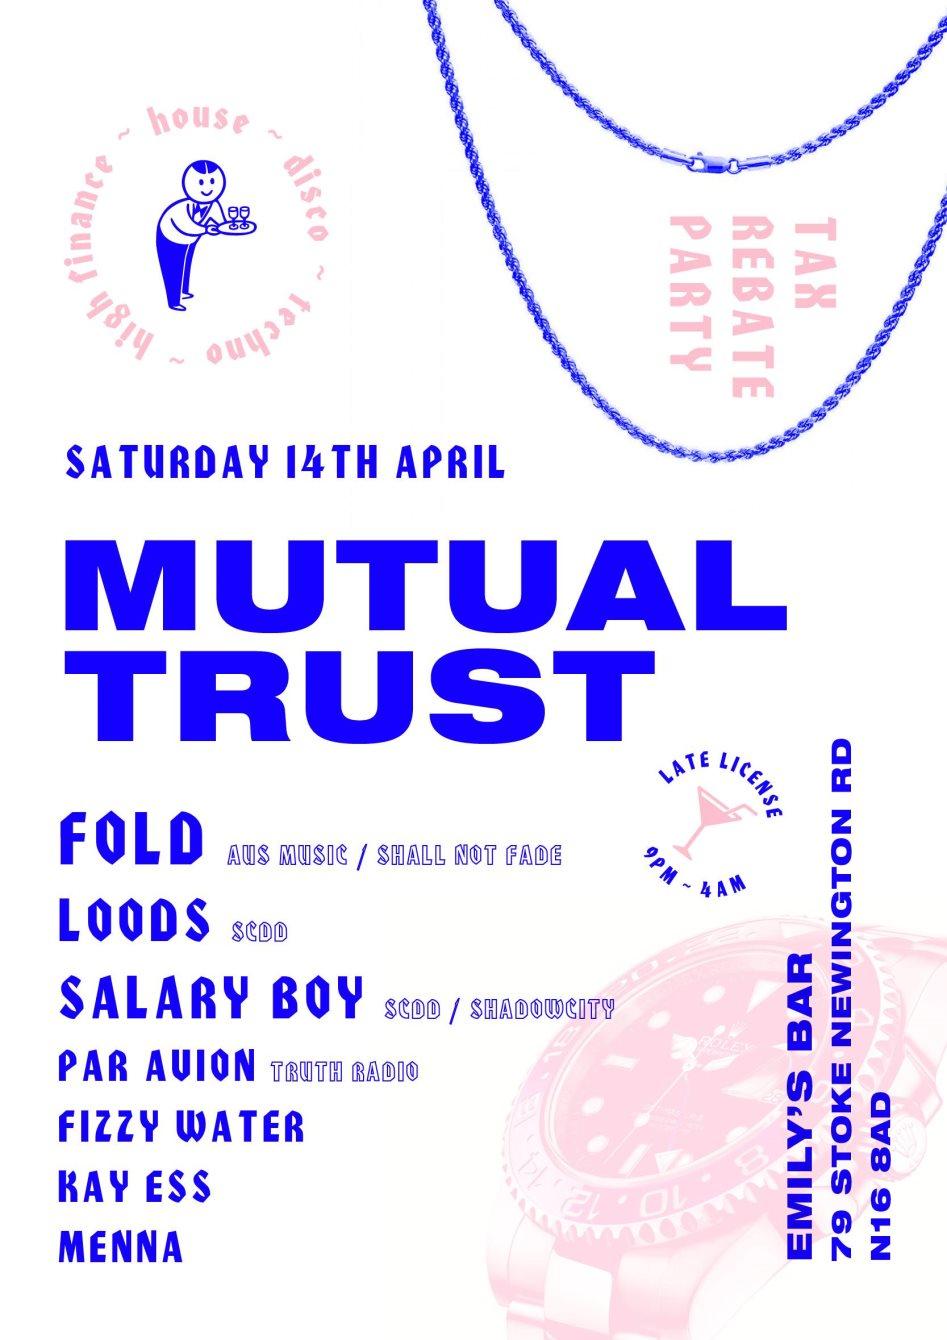 ra mutual trust 3 fold loods salary boy at emily s bar london